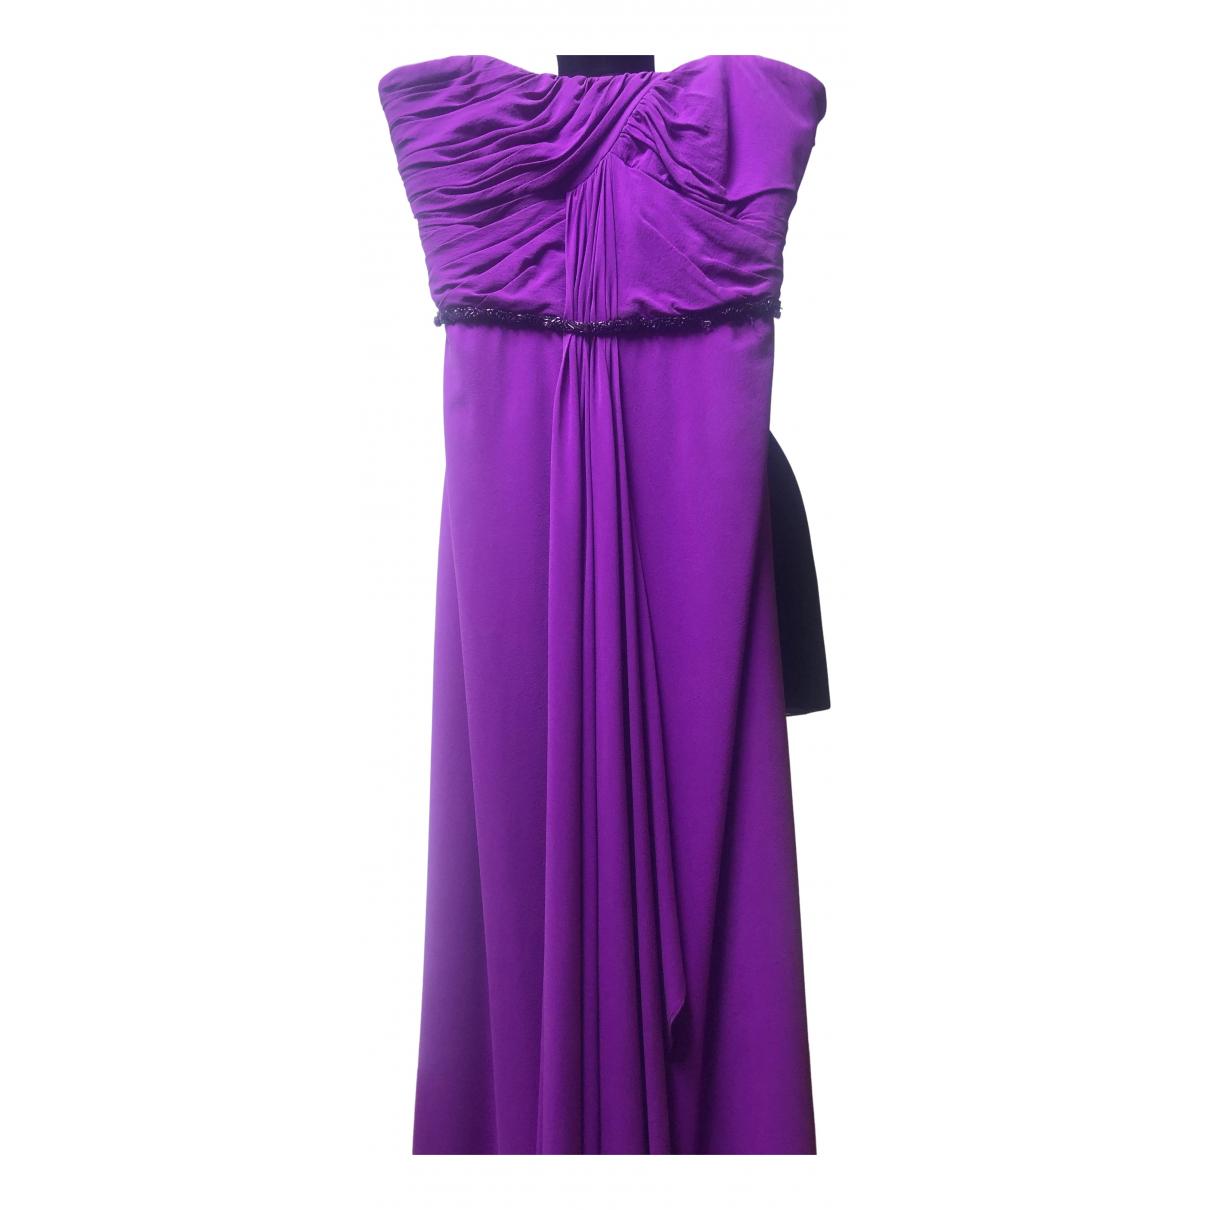 Badgley Mischka - Robe   pour femme en soie - violet